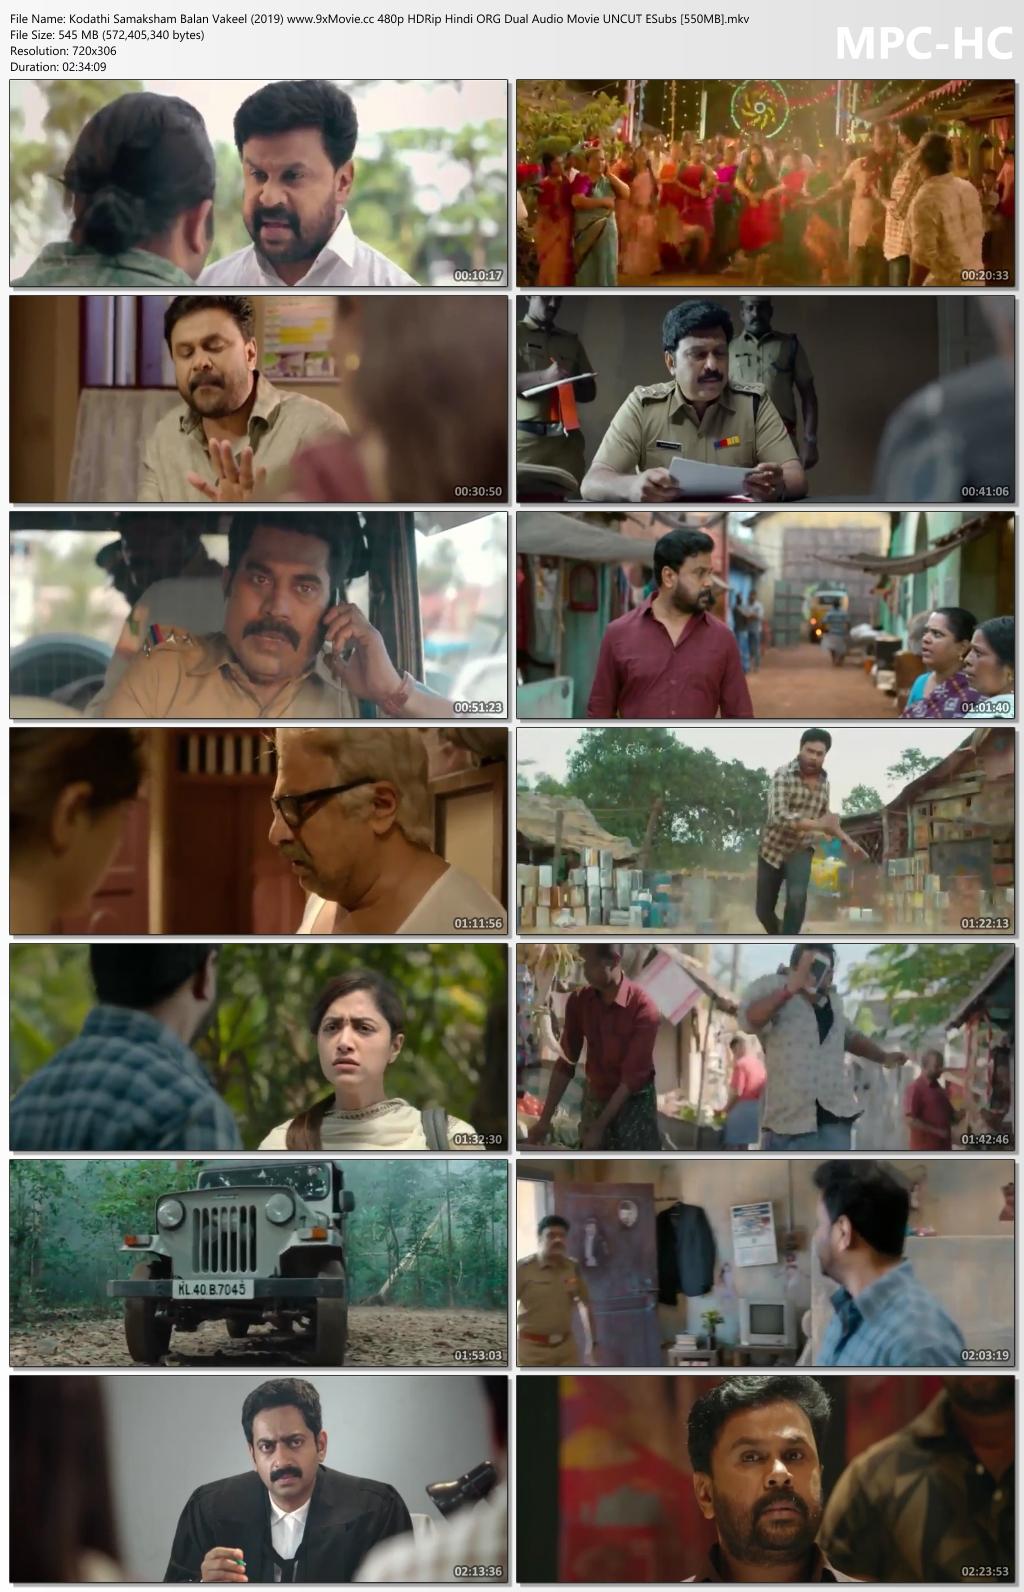 Kodathi-Samaksham-Balan-Vakeel-2019-www-9x-Movie-cc-480p-HDRip-Hindi-ORG-Dual-Audio-Movie-UNCUT-ESub